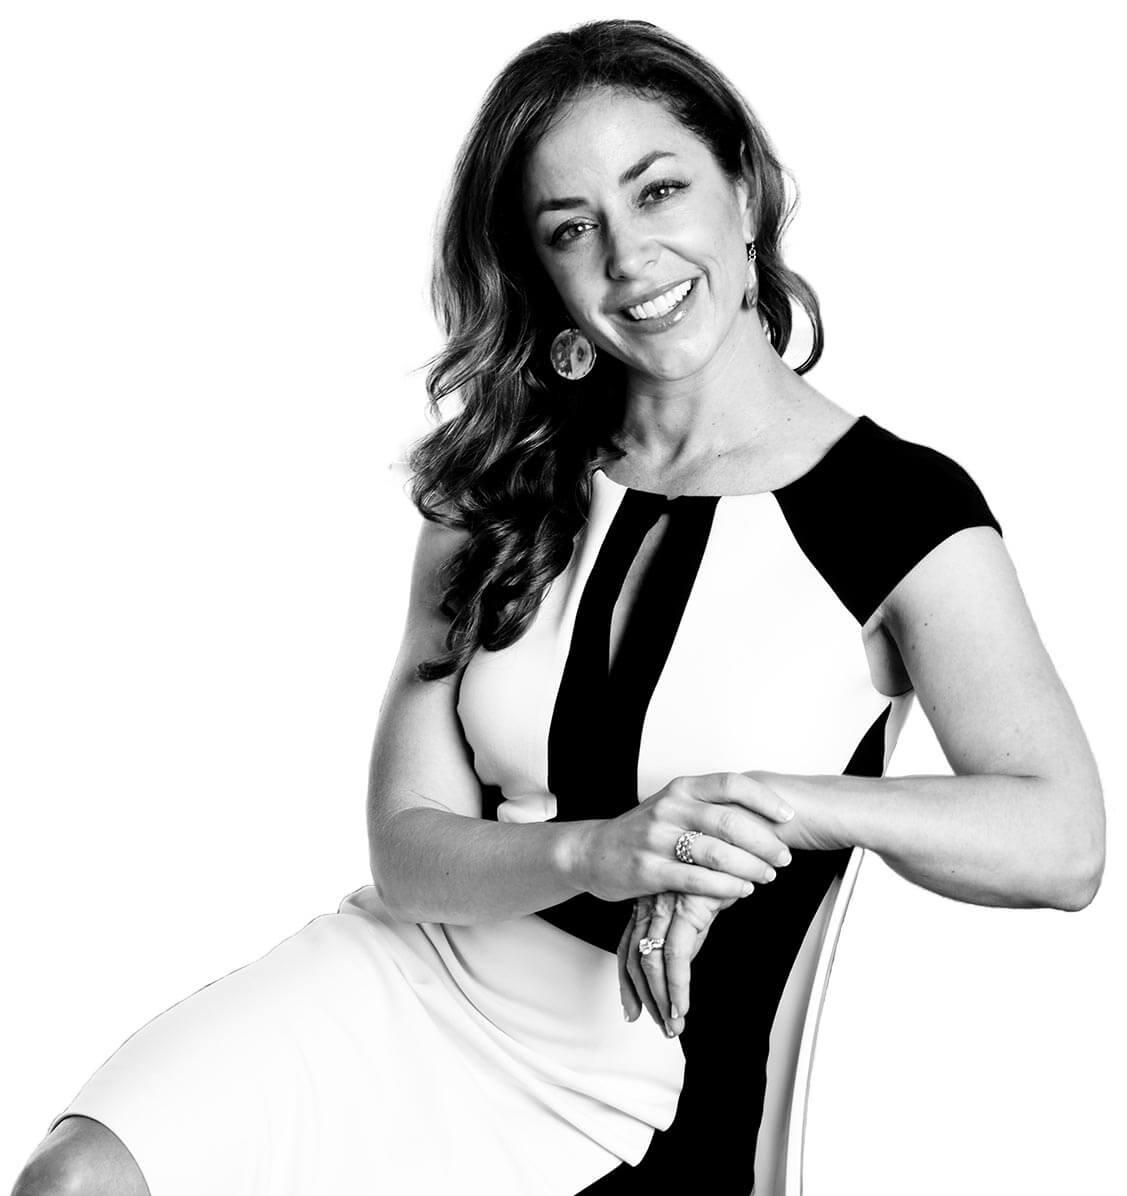 Dr. Kristina Price